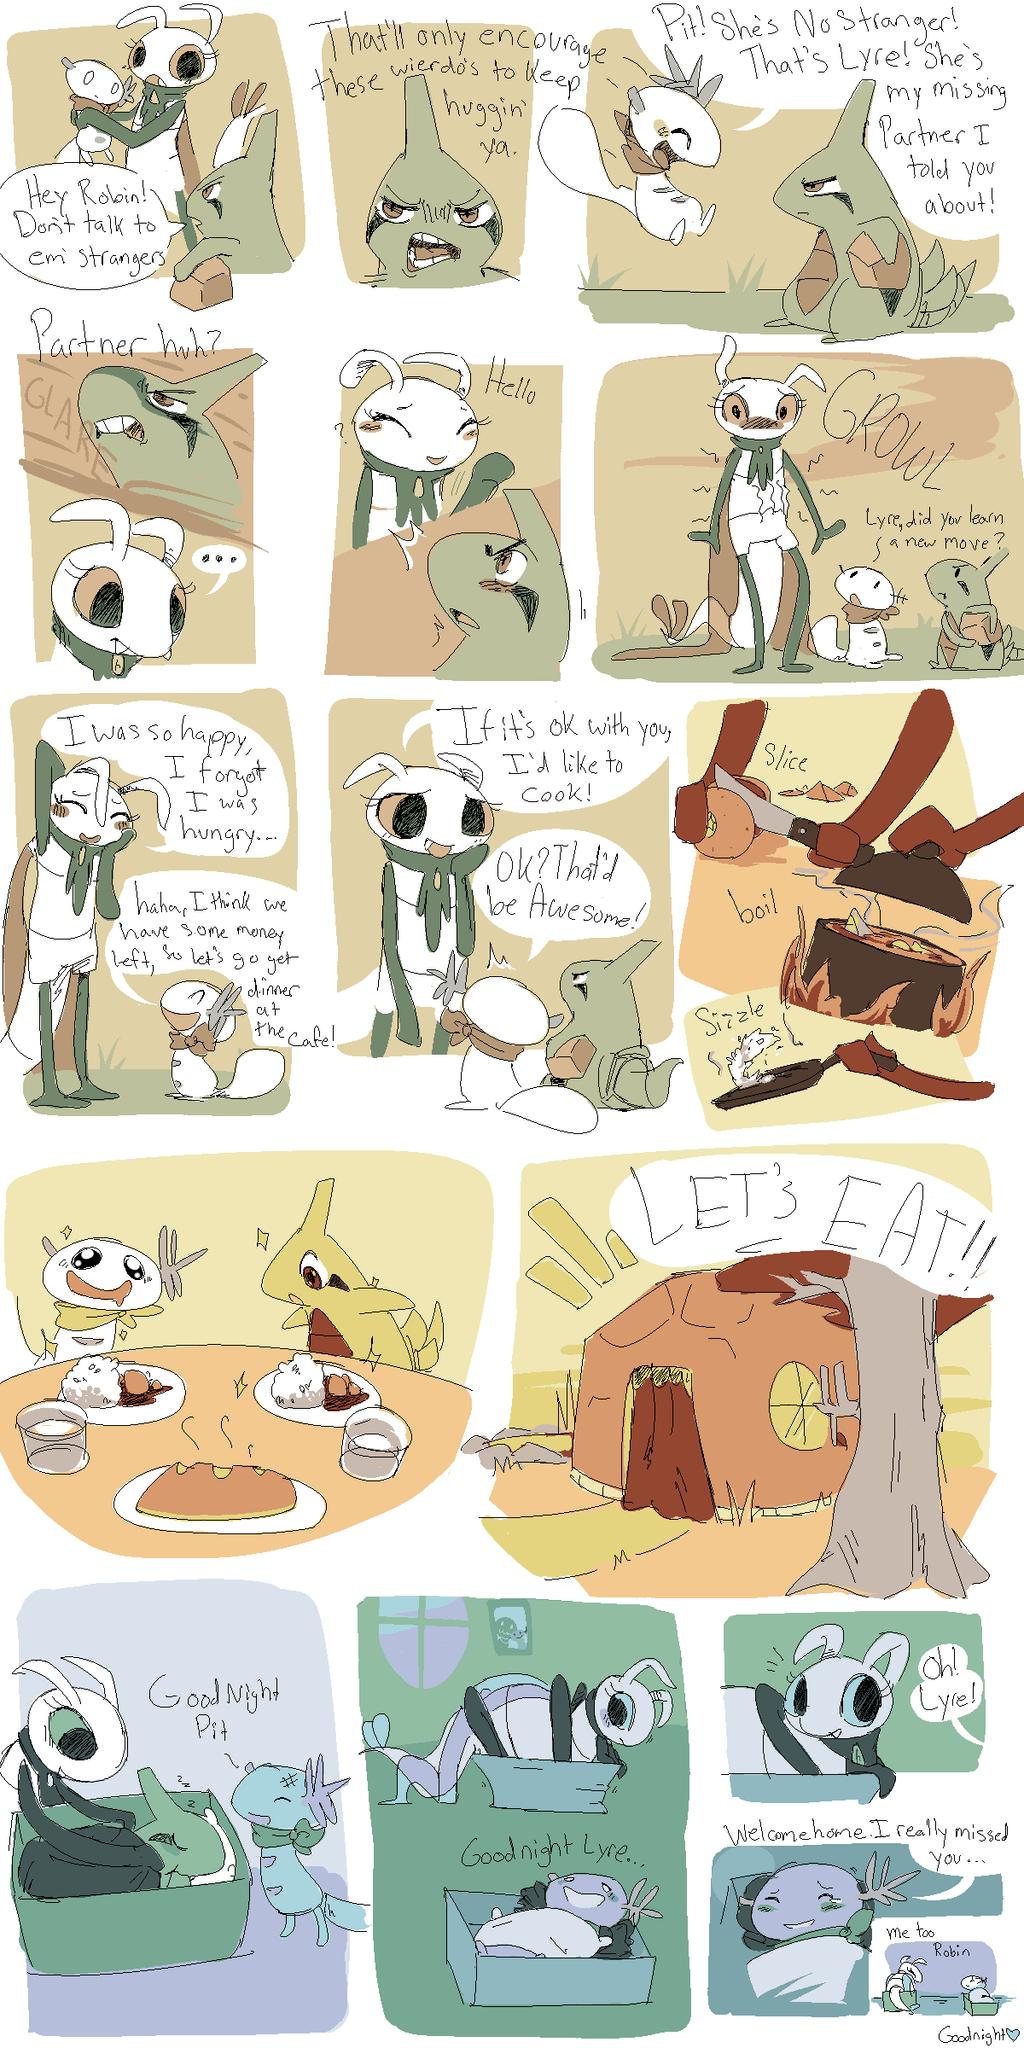 Reunite Part 3 by CrazyIguana